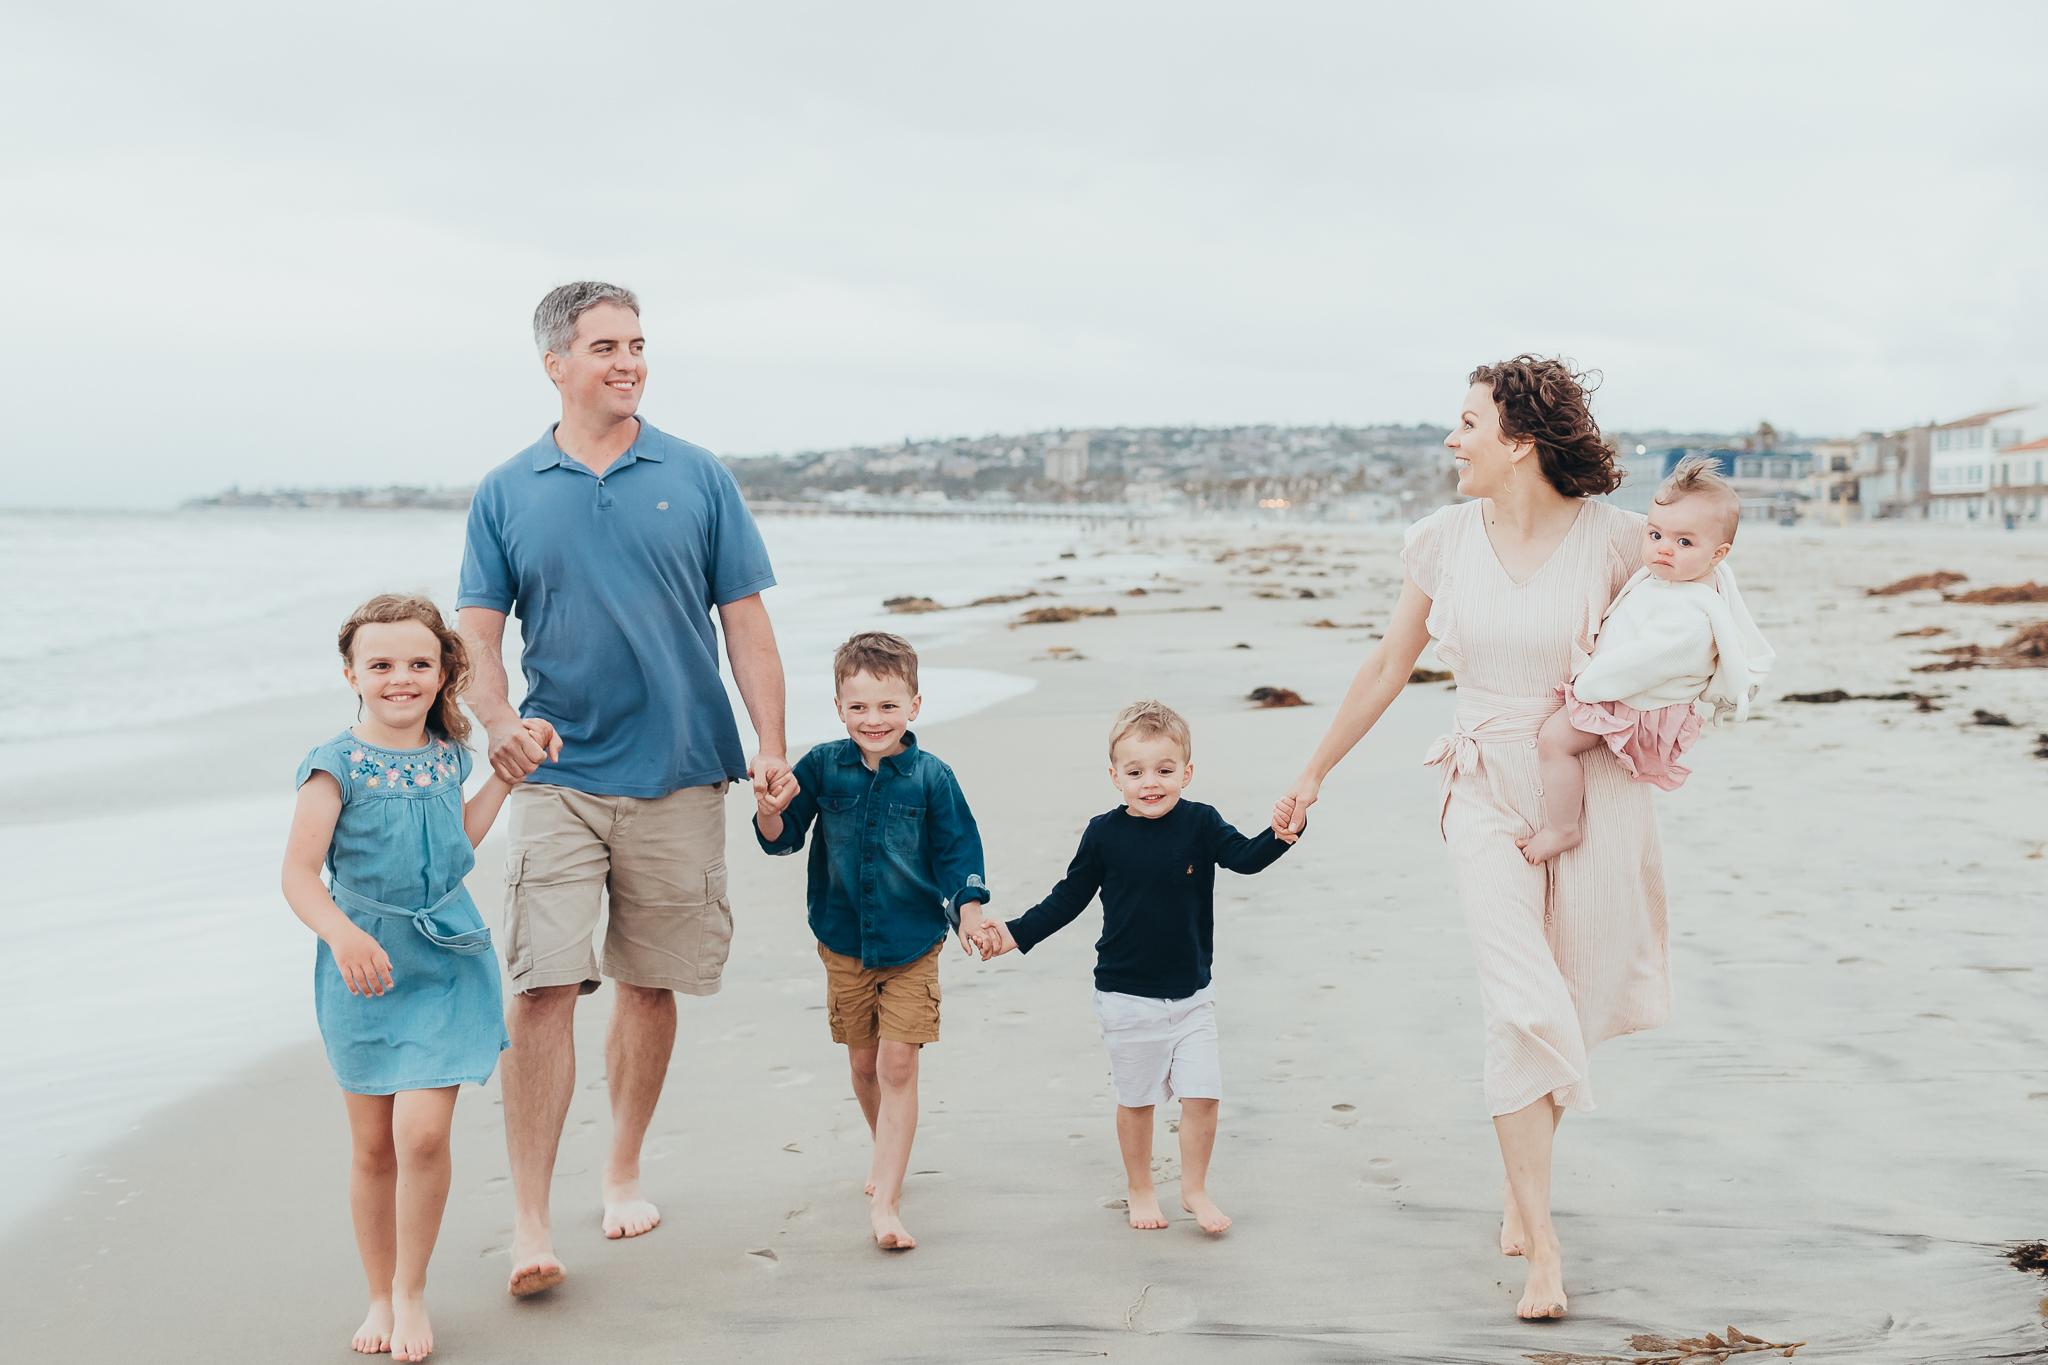 Mission Beach Vacation Family Photos San Diego Christine Dammann-13.jpg